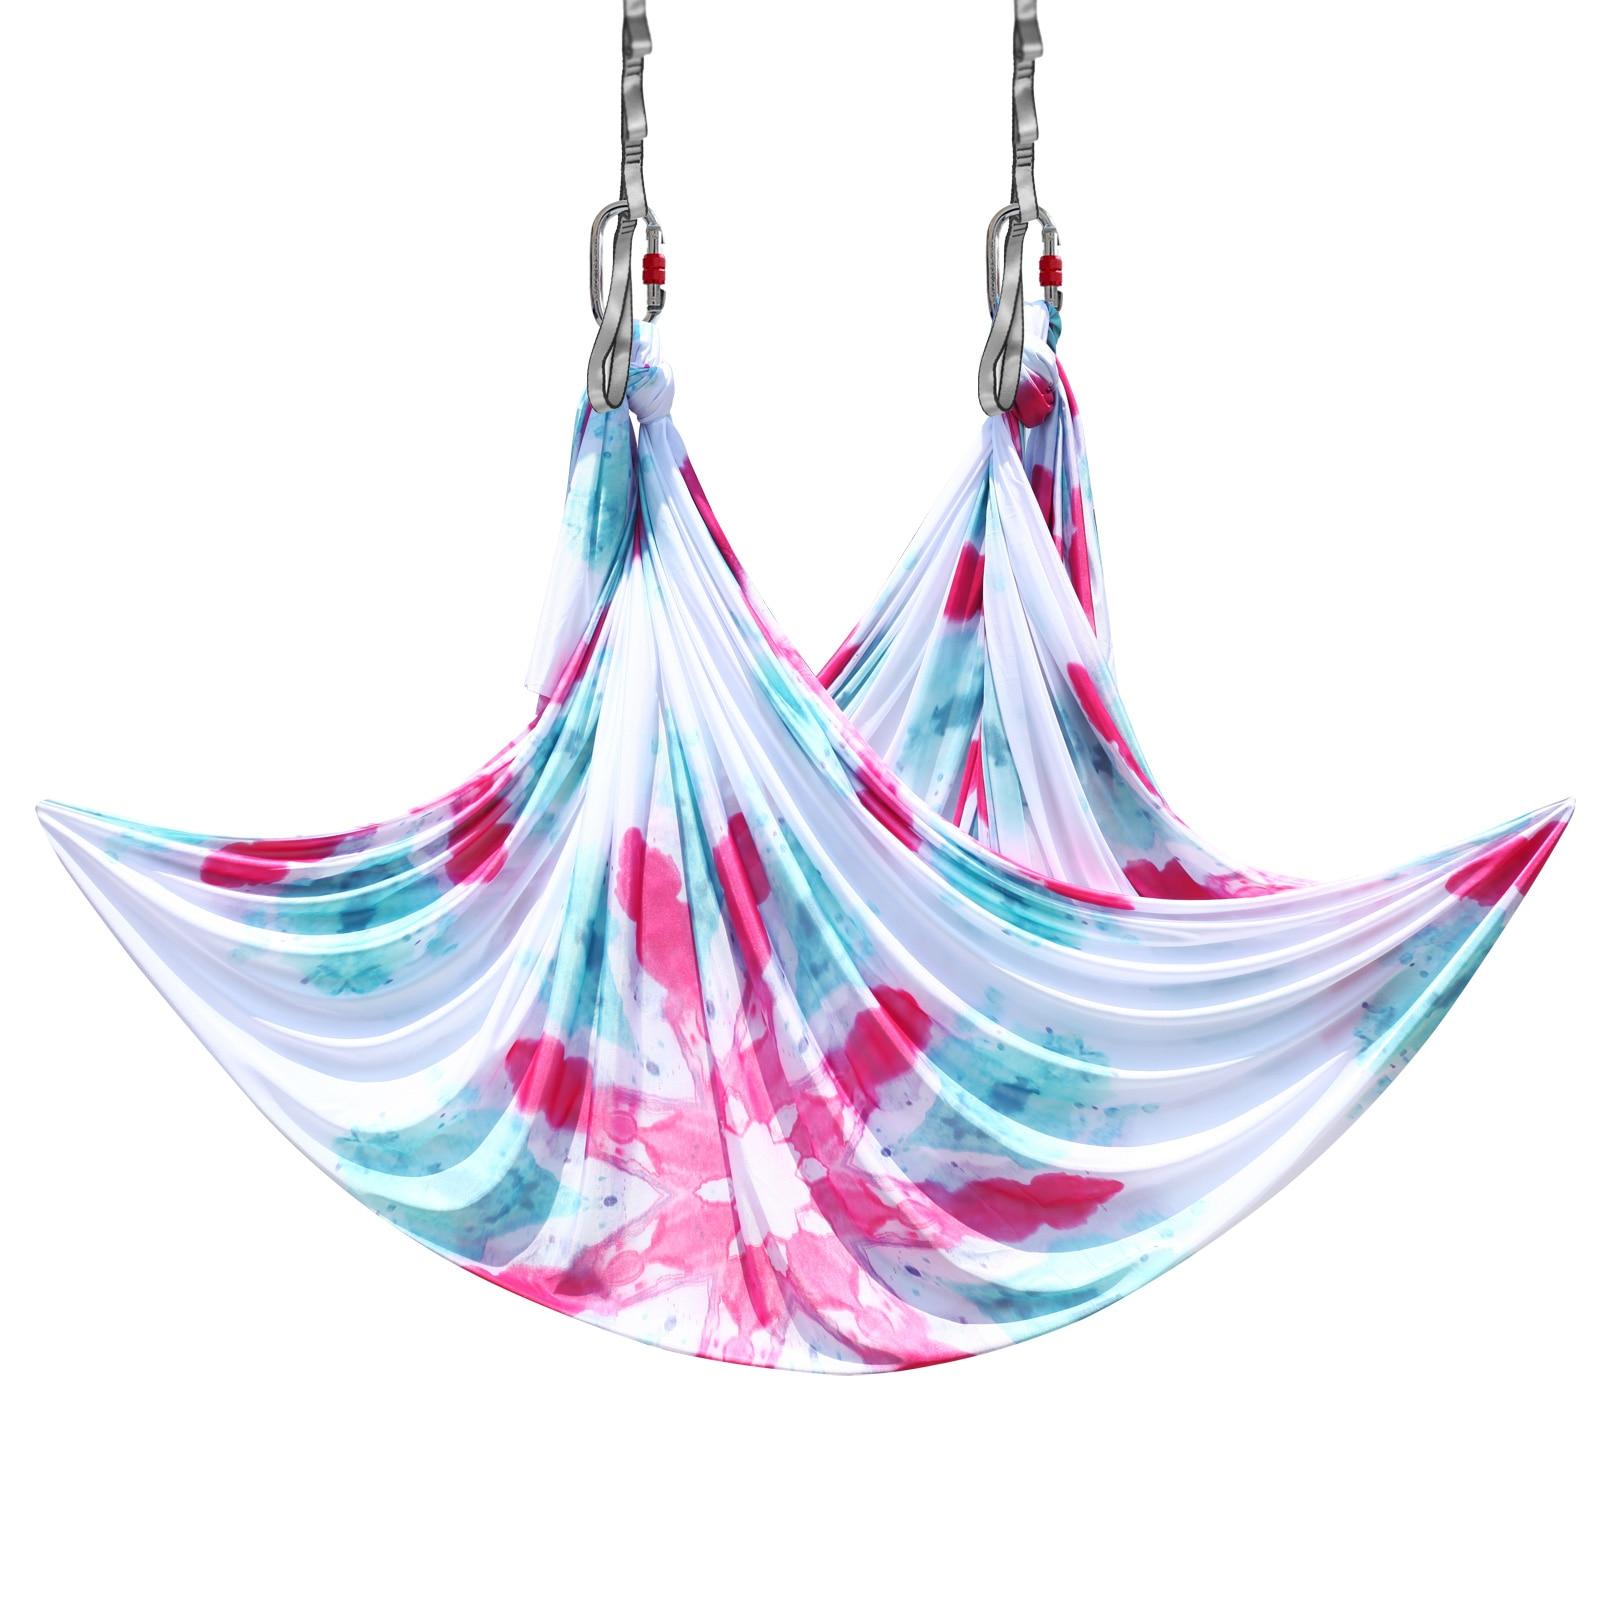 Permalink to PRIOR FITNESS 5 Meter Aerial Yoga Hammock Faric High Quality  Aerial Silks Low Stretch Anti Gravity Yoga Equipment